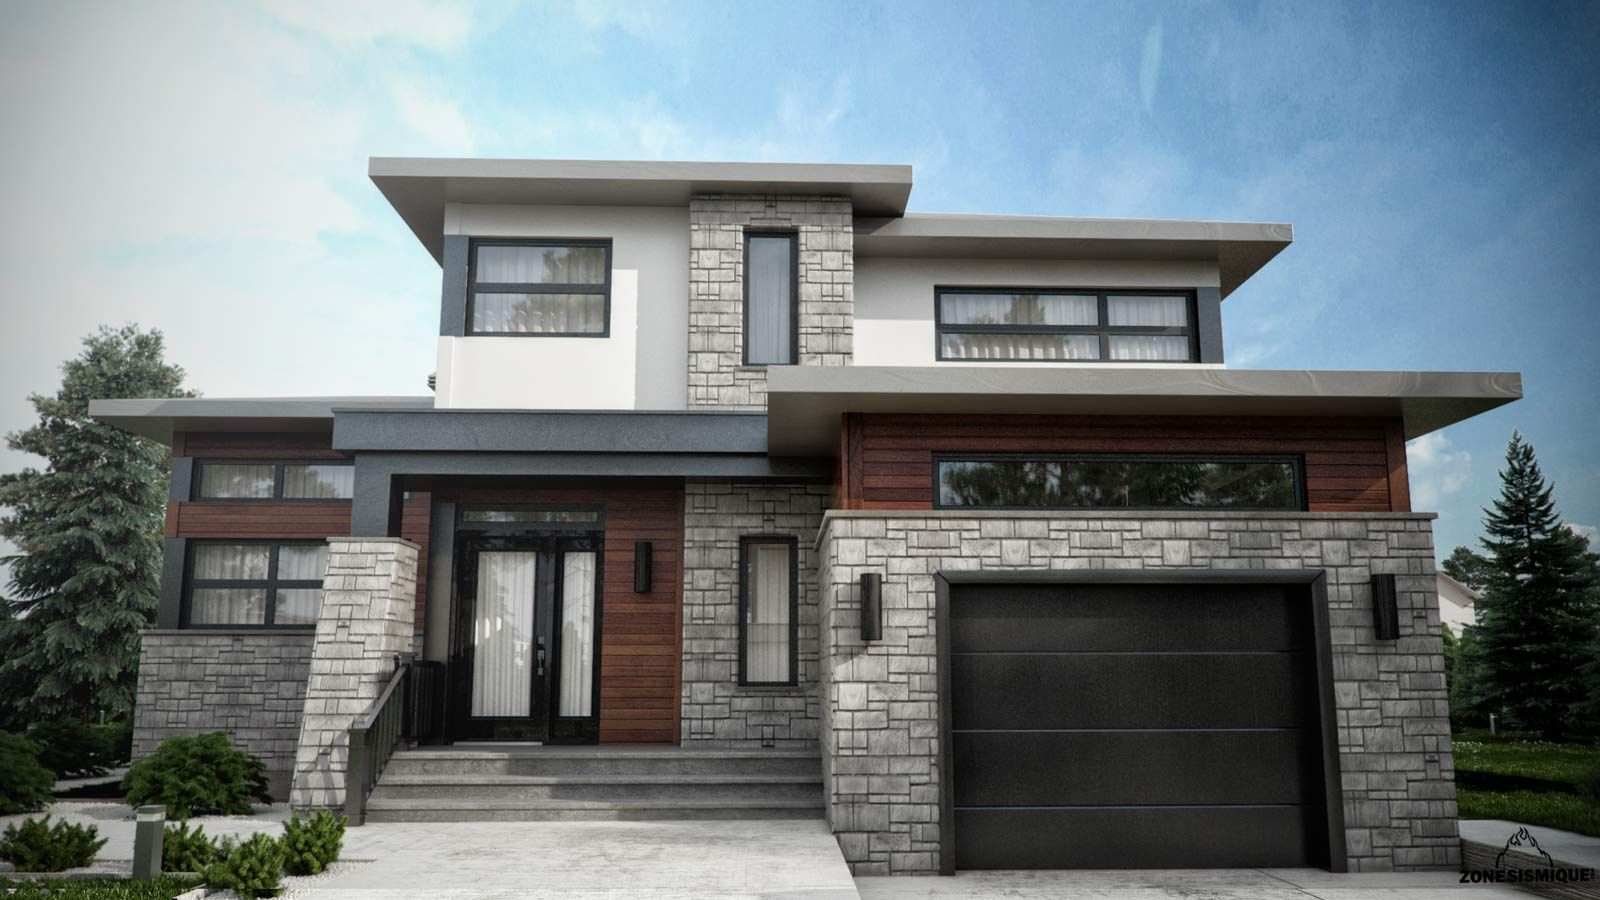 zone-sismique-habitation-malie-maison-moderne-3d-Des-Simes-v4 ‹ _- ...